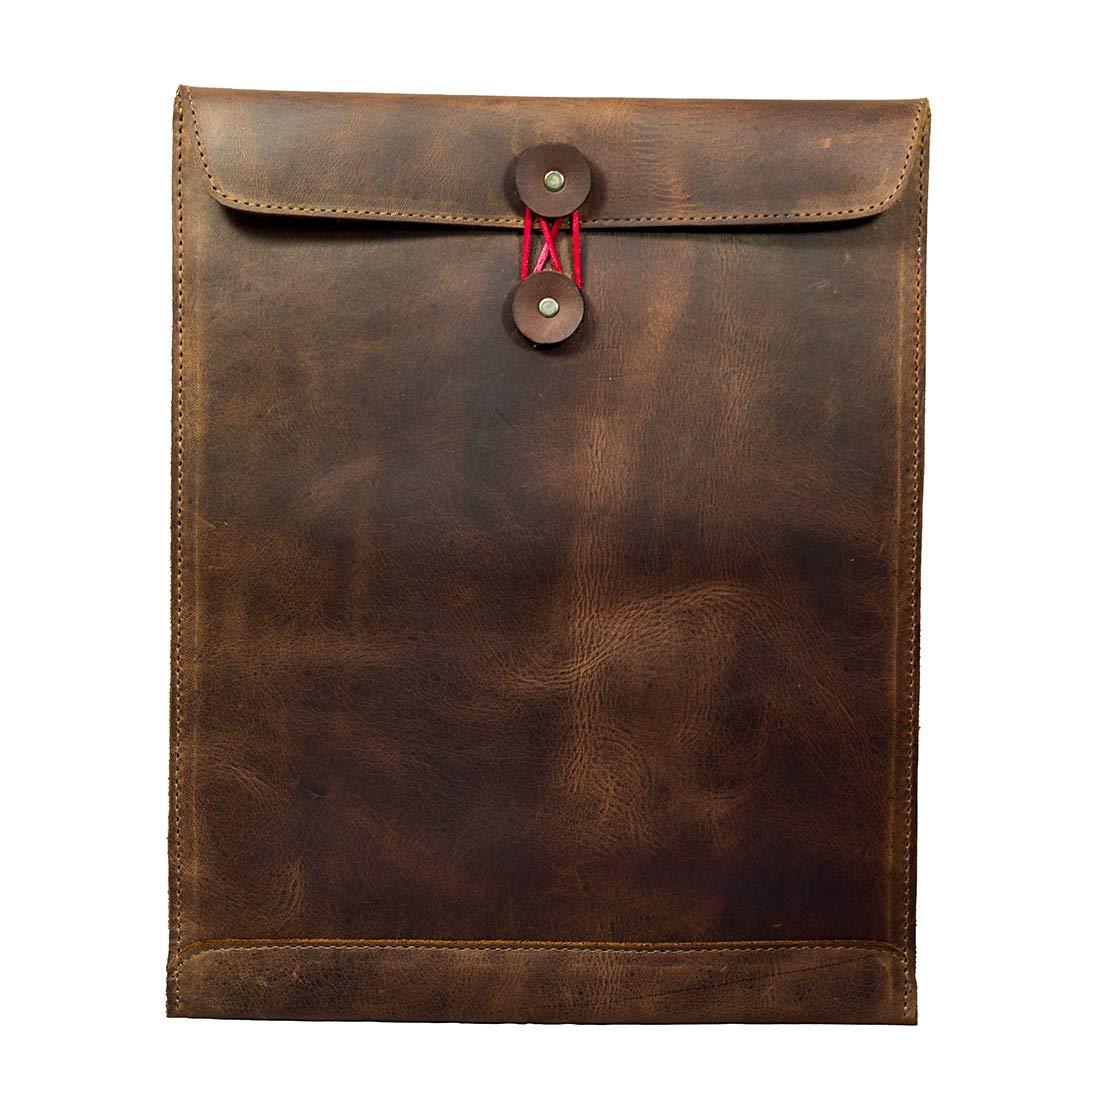 Hide & Drink, Leather Mailing Envelope Document Holder/Office & Work Essentials Handmade, Includes 101 Year Warranty :: Bourbon Brown